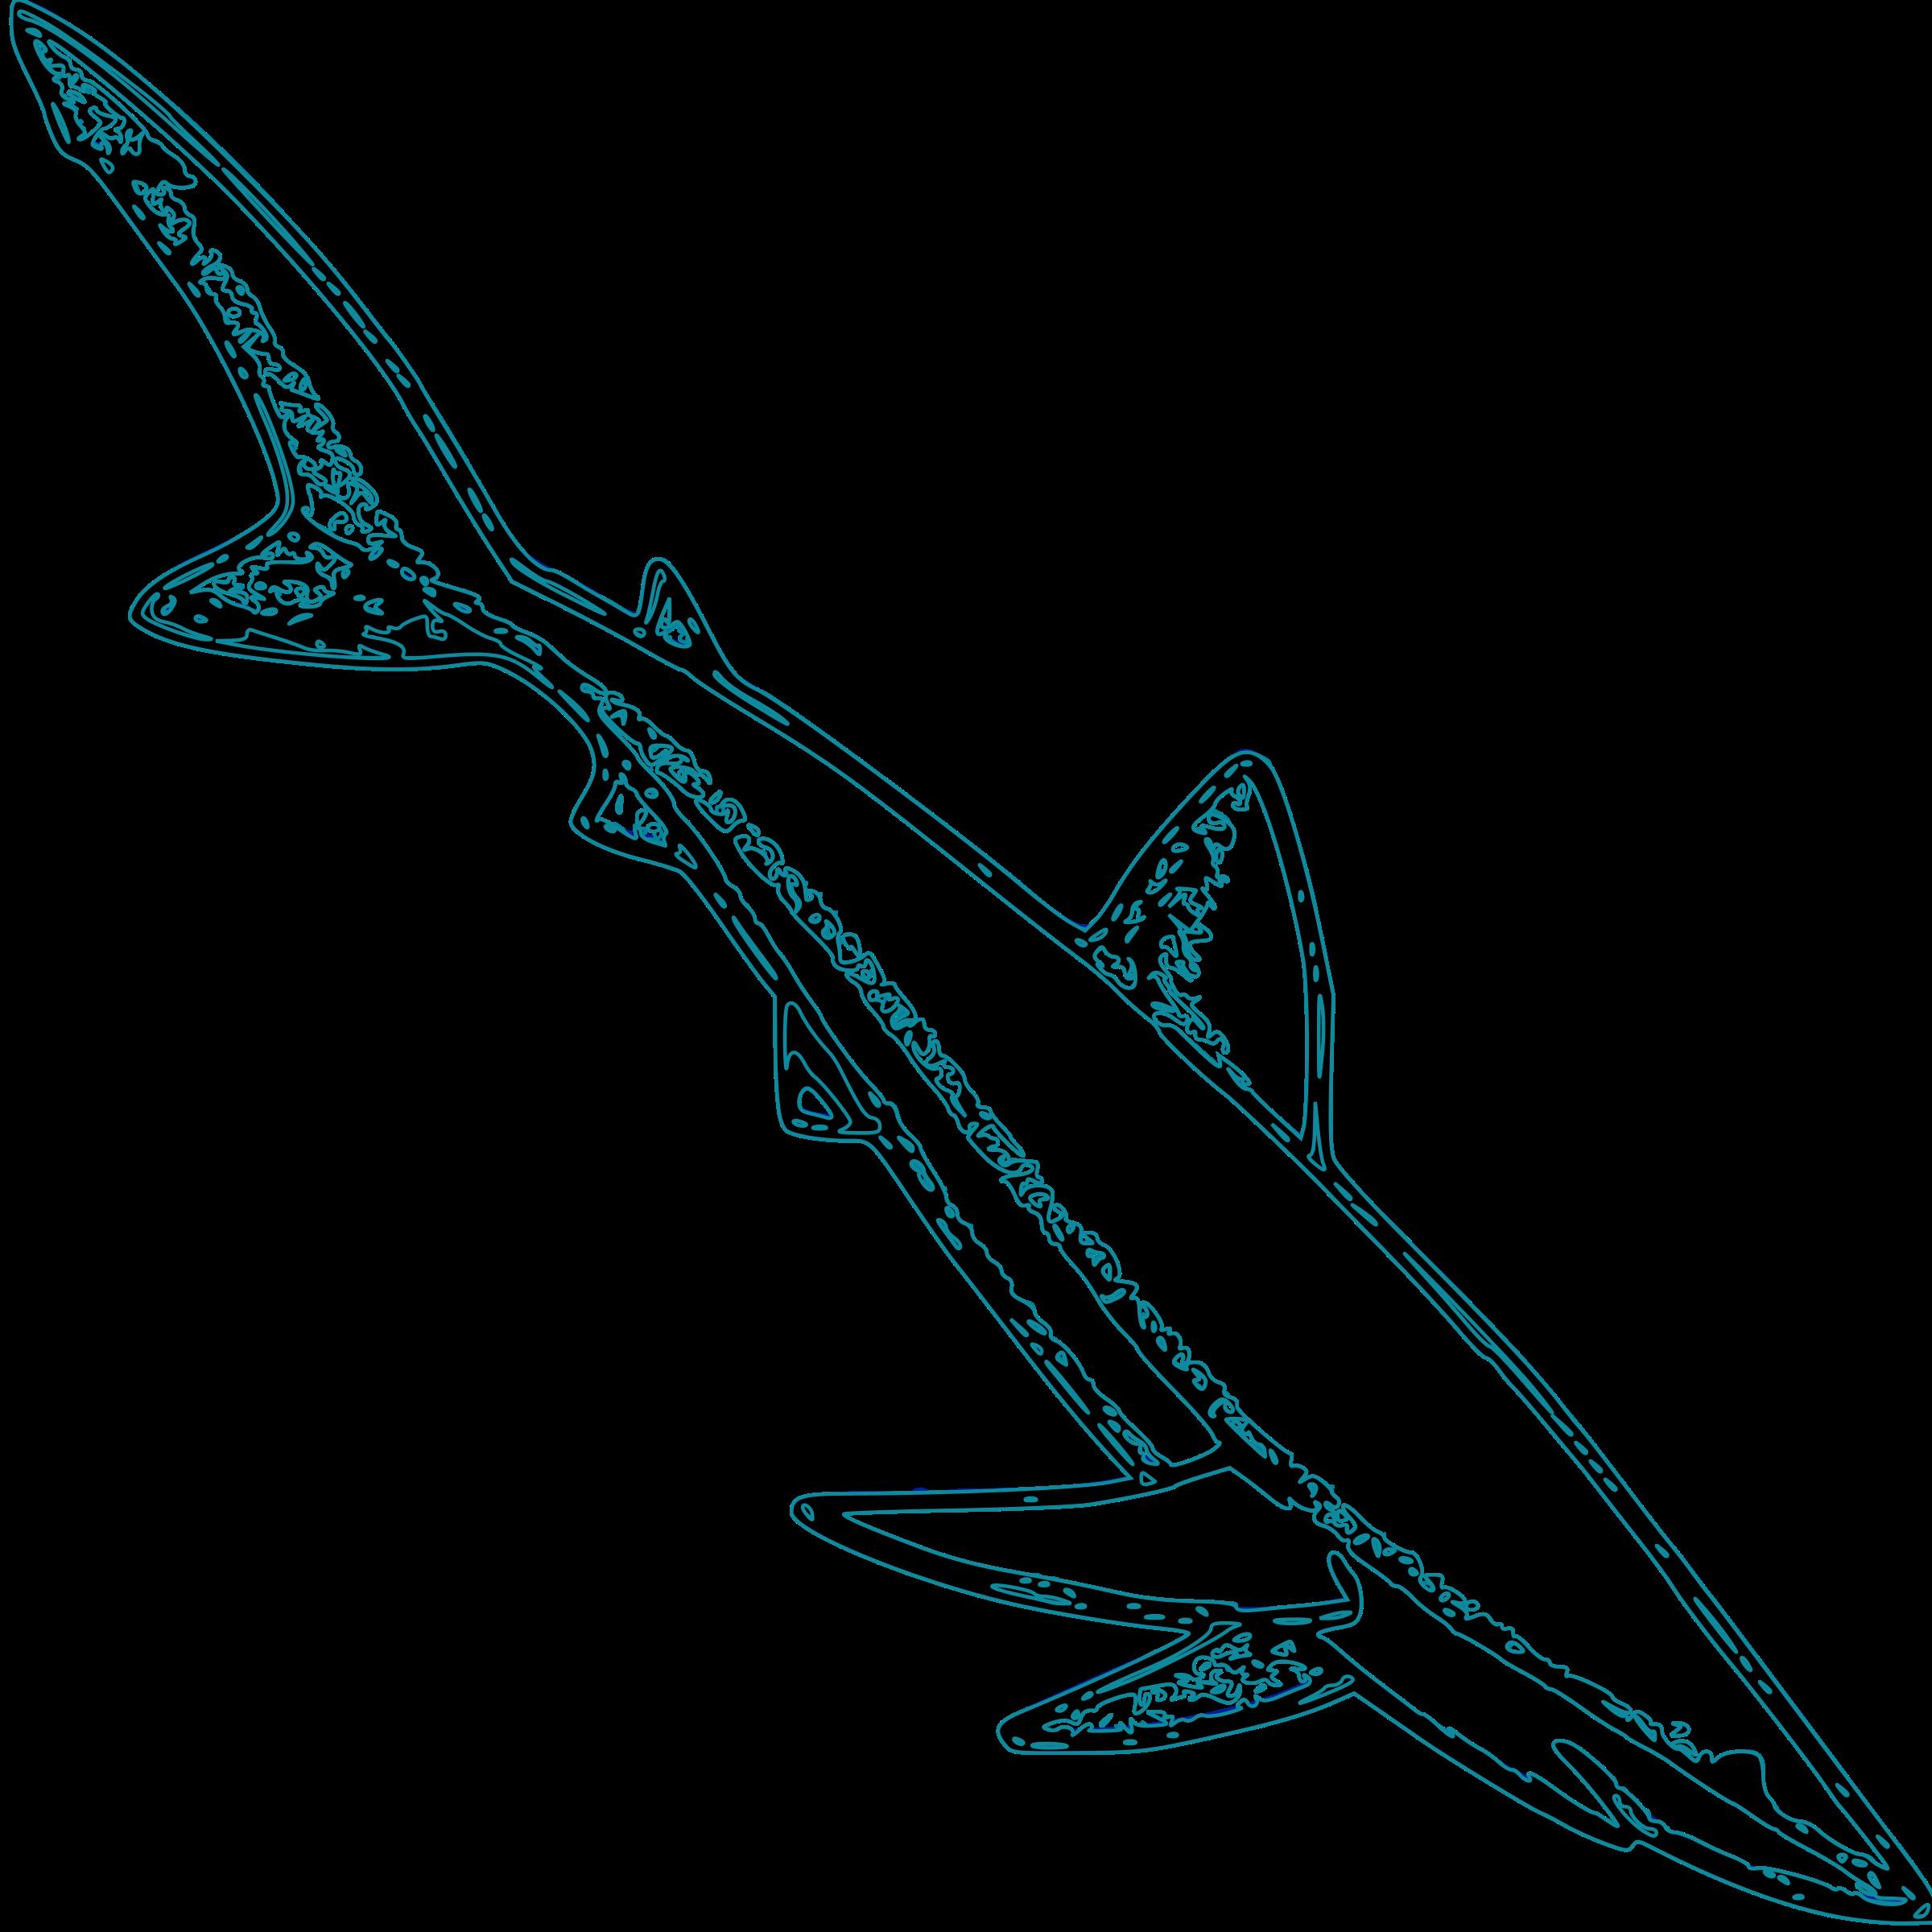 Big image png. Clipart shark blue shark